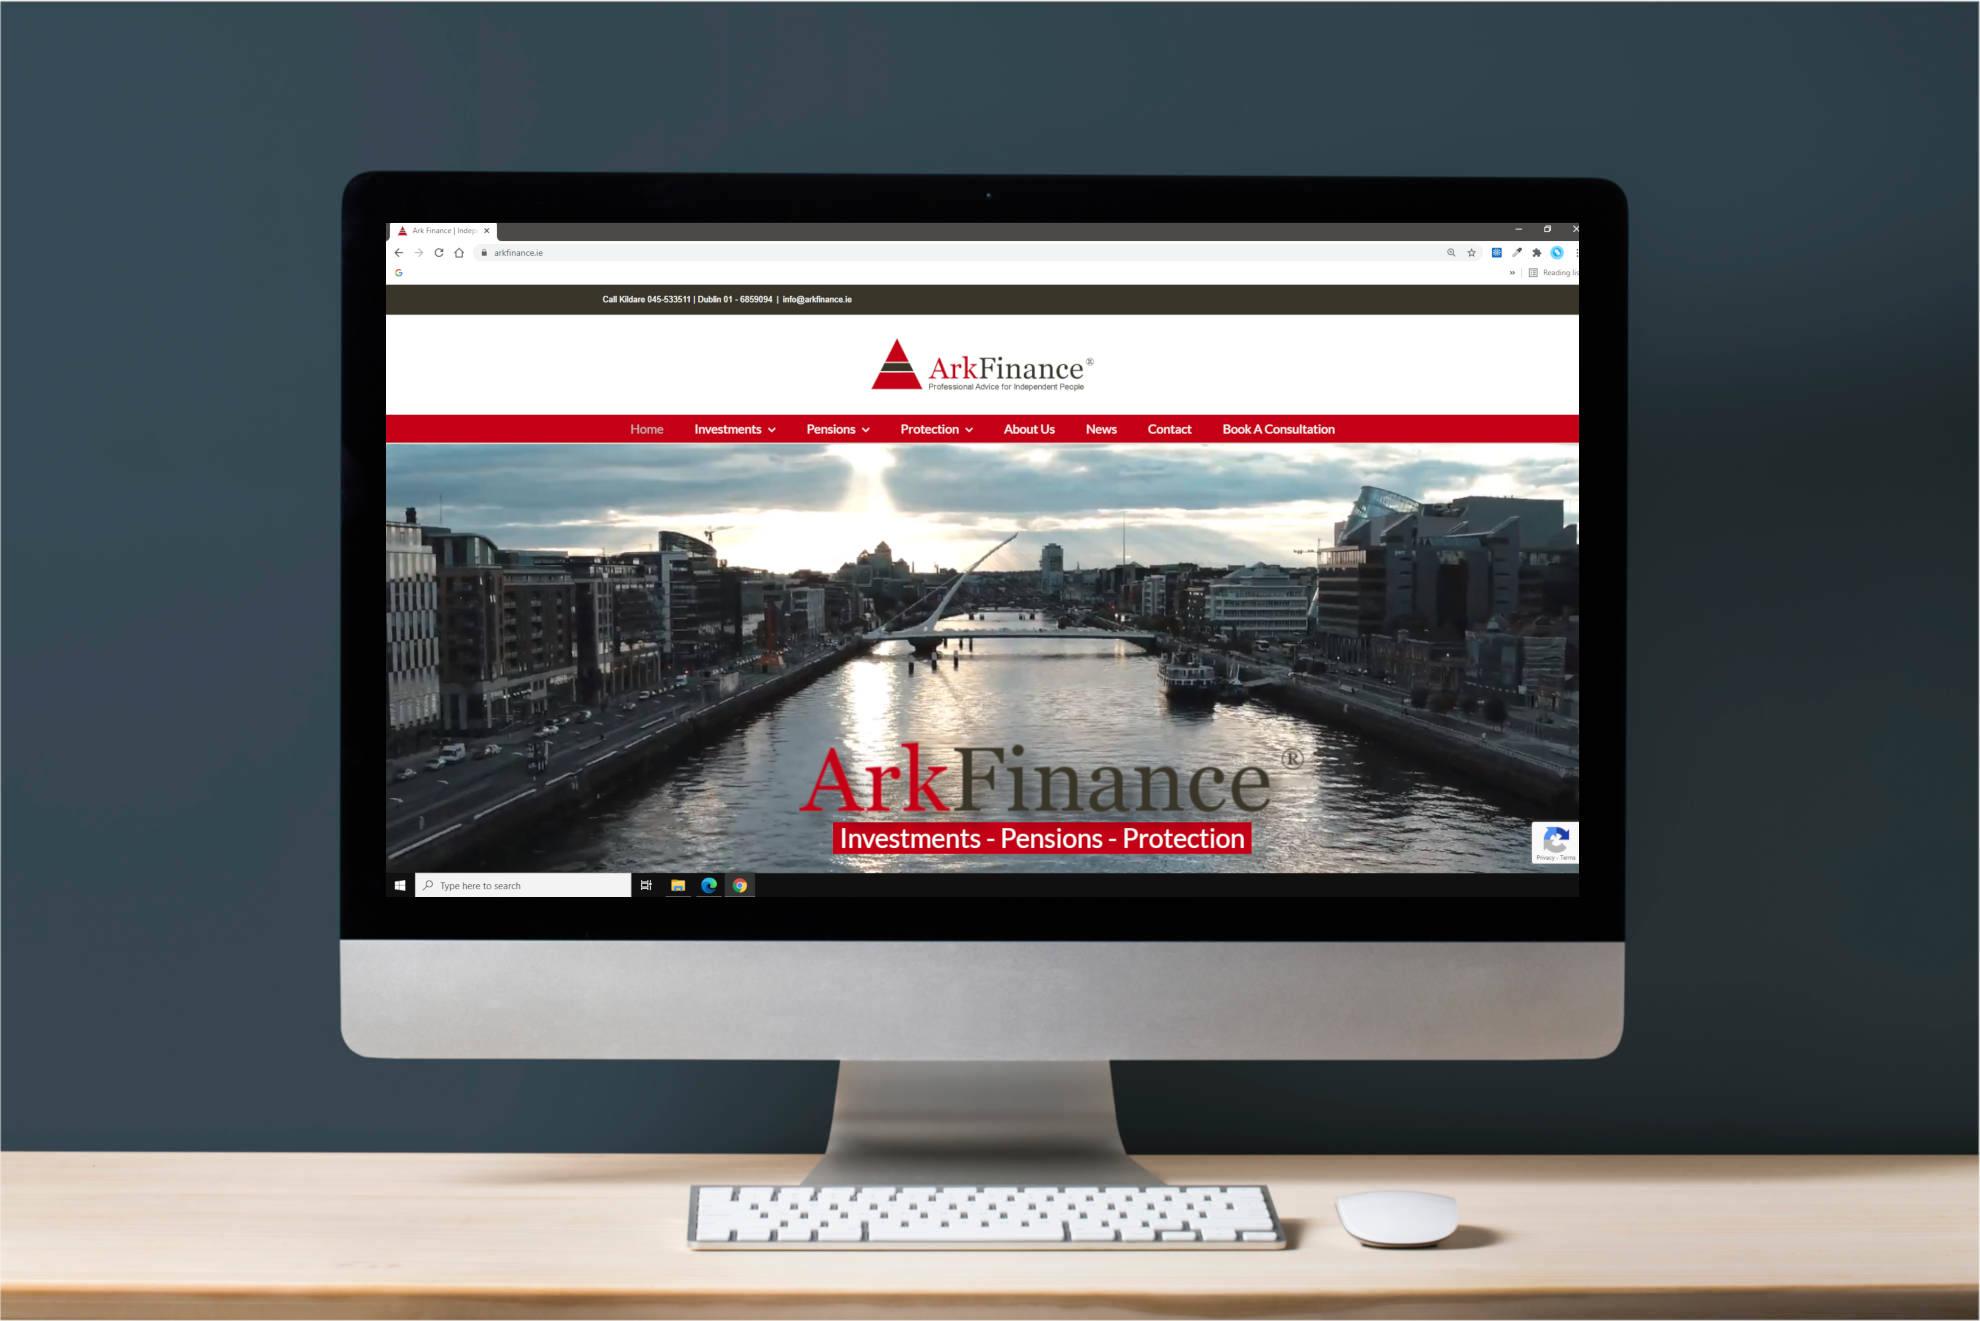 Ark Finance Applejack Marketing